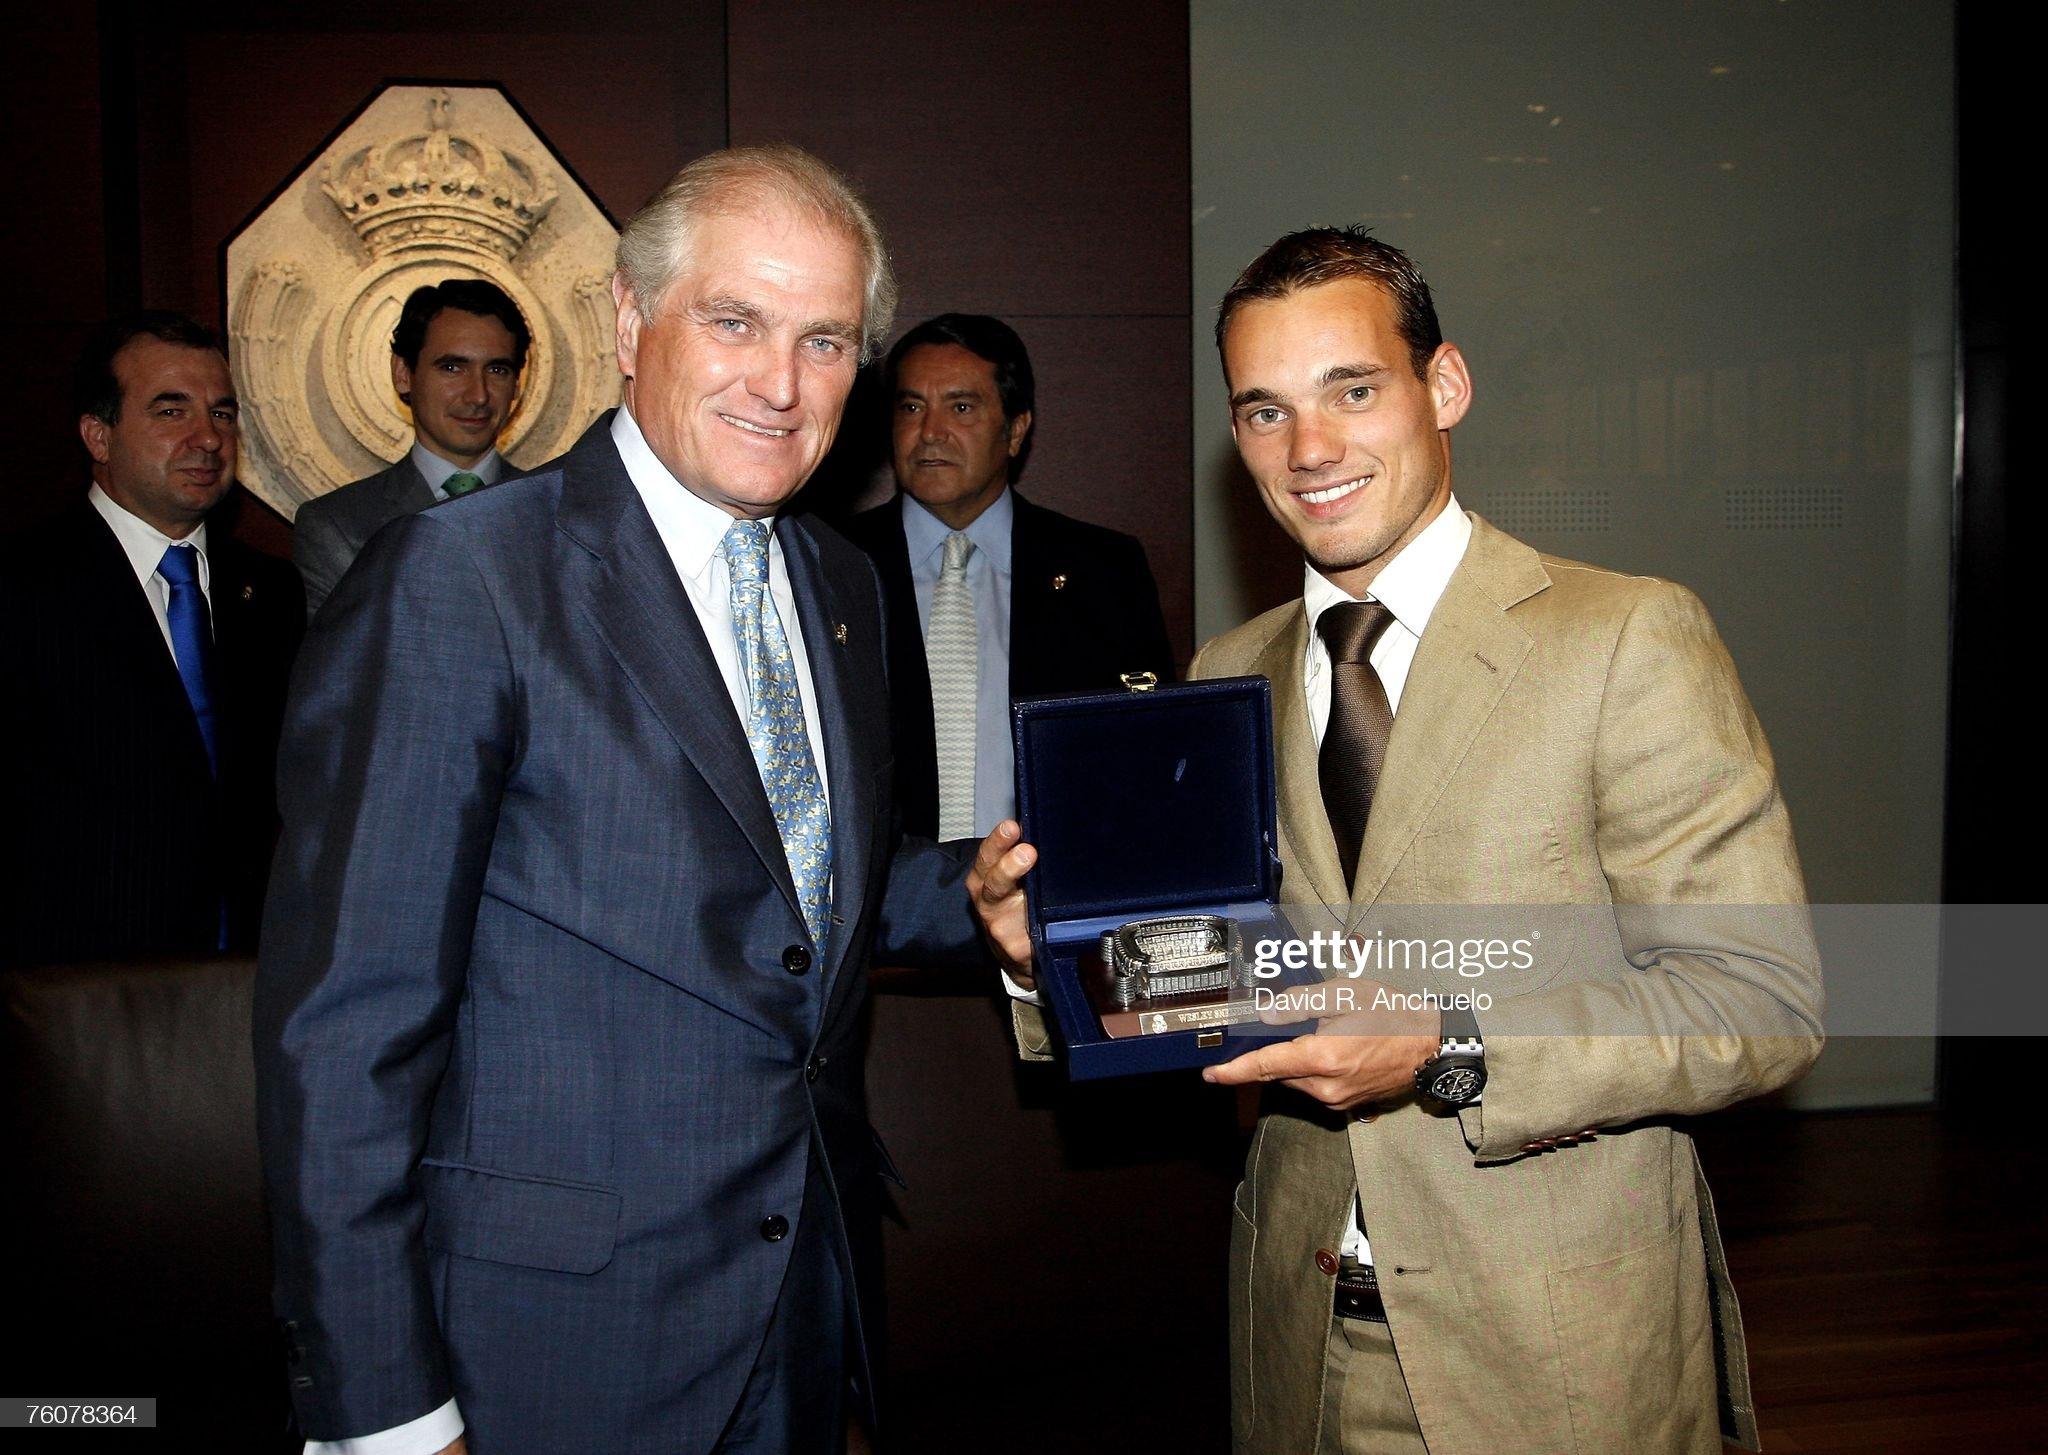 ¿Cuánto mide Ramón Calderón? Wesley-sneijder-receives-a-present-from-ramon-calderon-reals-before-picture-id76078364?s=2048x2048